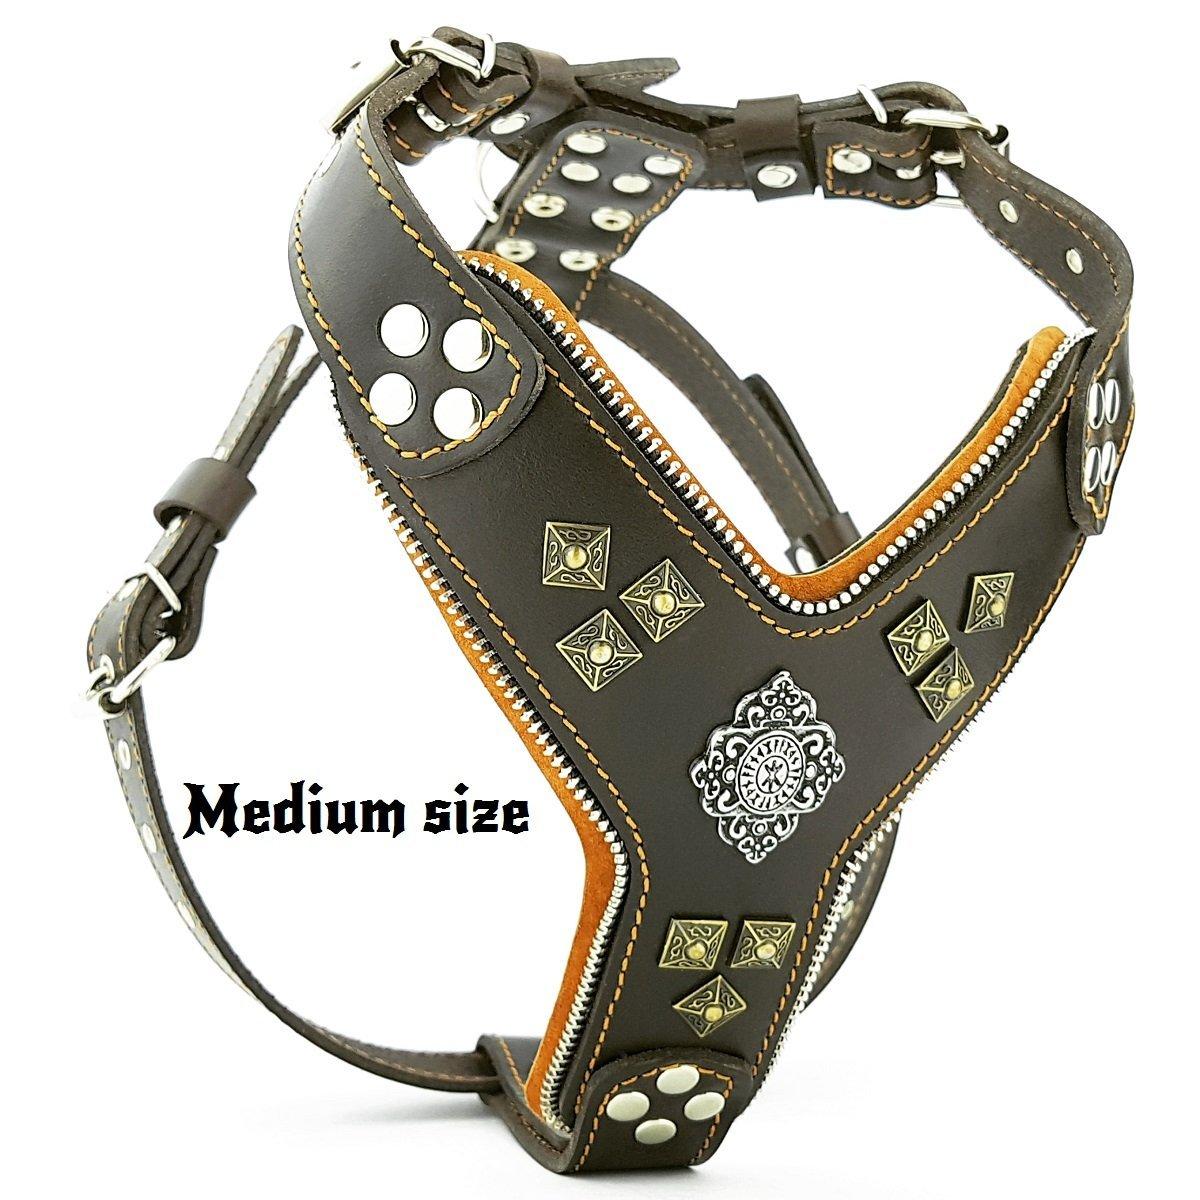 Bestia ''Aztec Big Dog Leather Harness. 2 Tone Rivet Decorations. Zipper Decoration. Foam and Leather Padding Handmade in Europe.